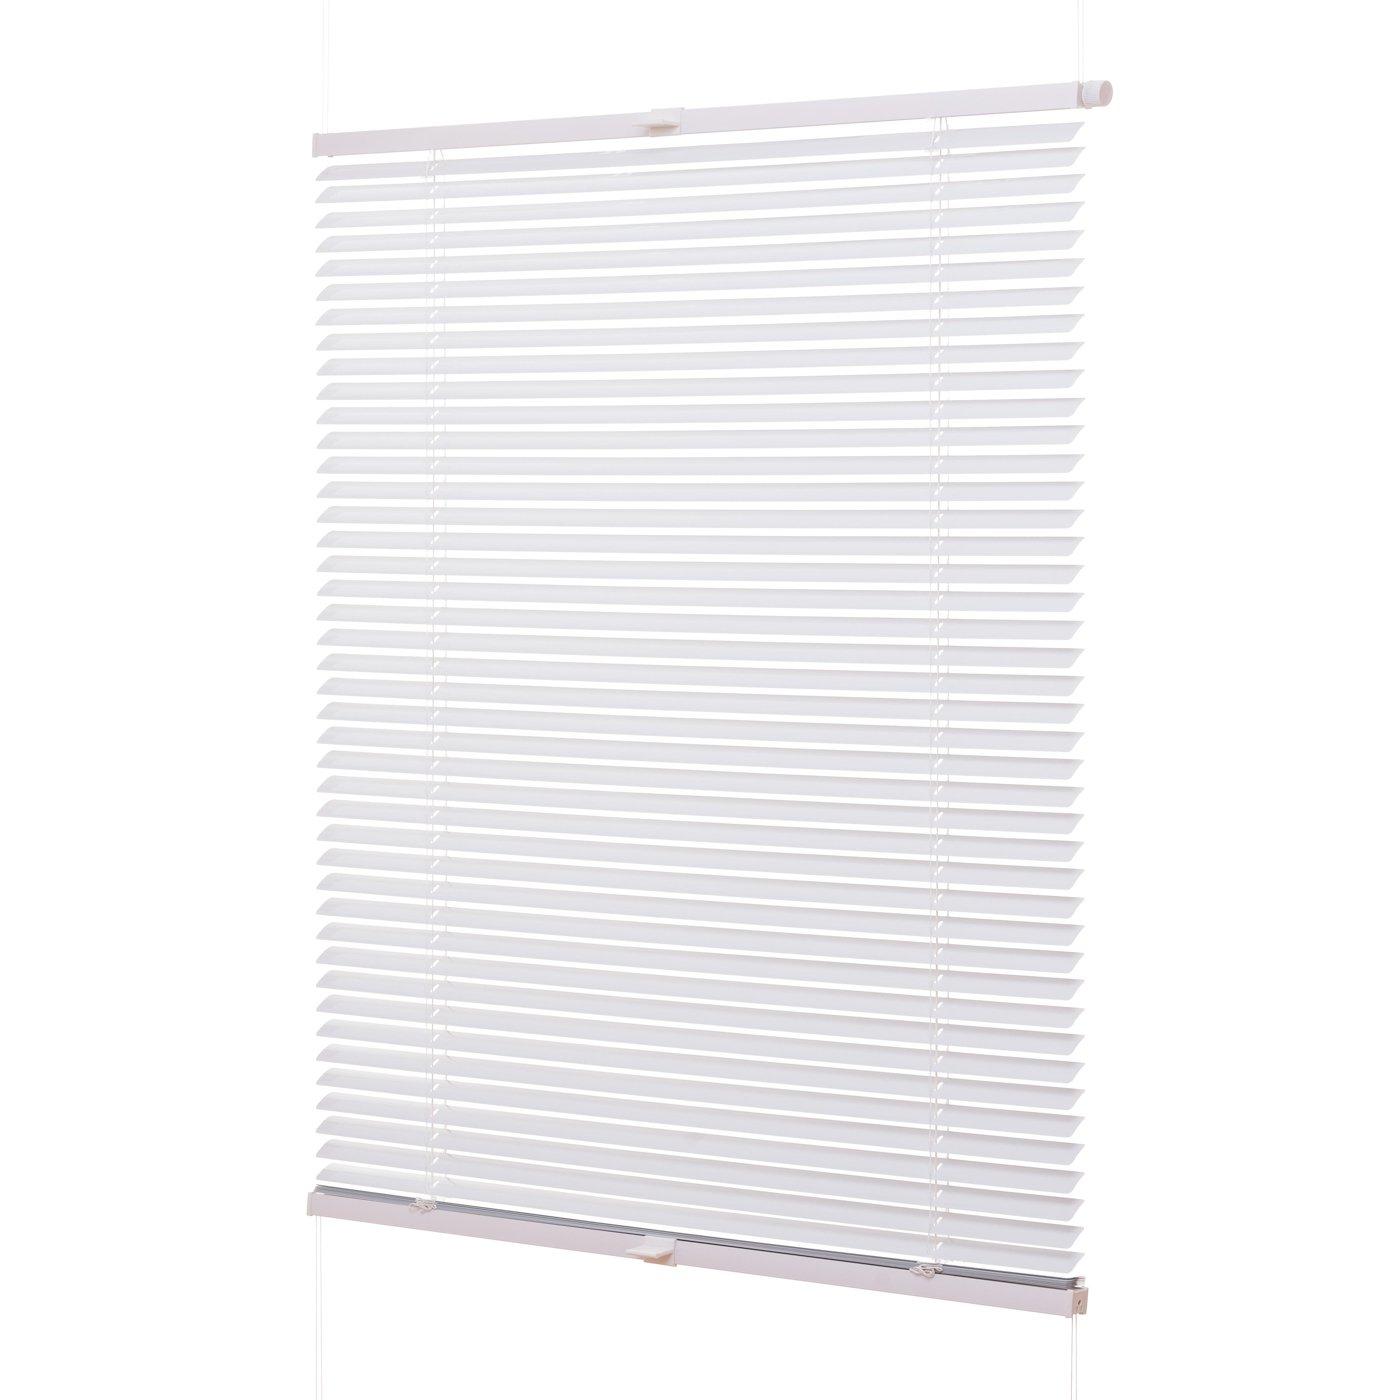 Ventanara Jalousie Aluminium ohne Bohren Bohren Bohren Weiß inklusive Montagematerial 90 x 220 cm 38d72d